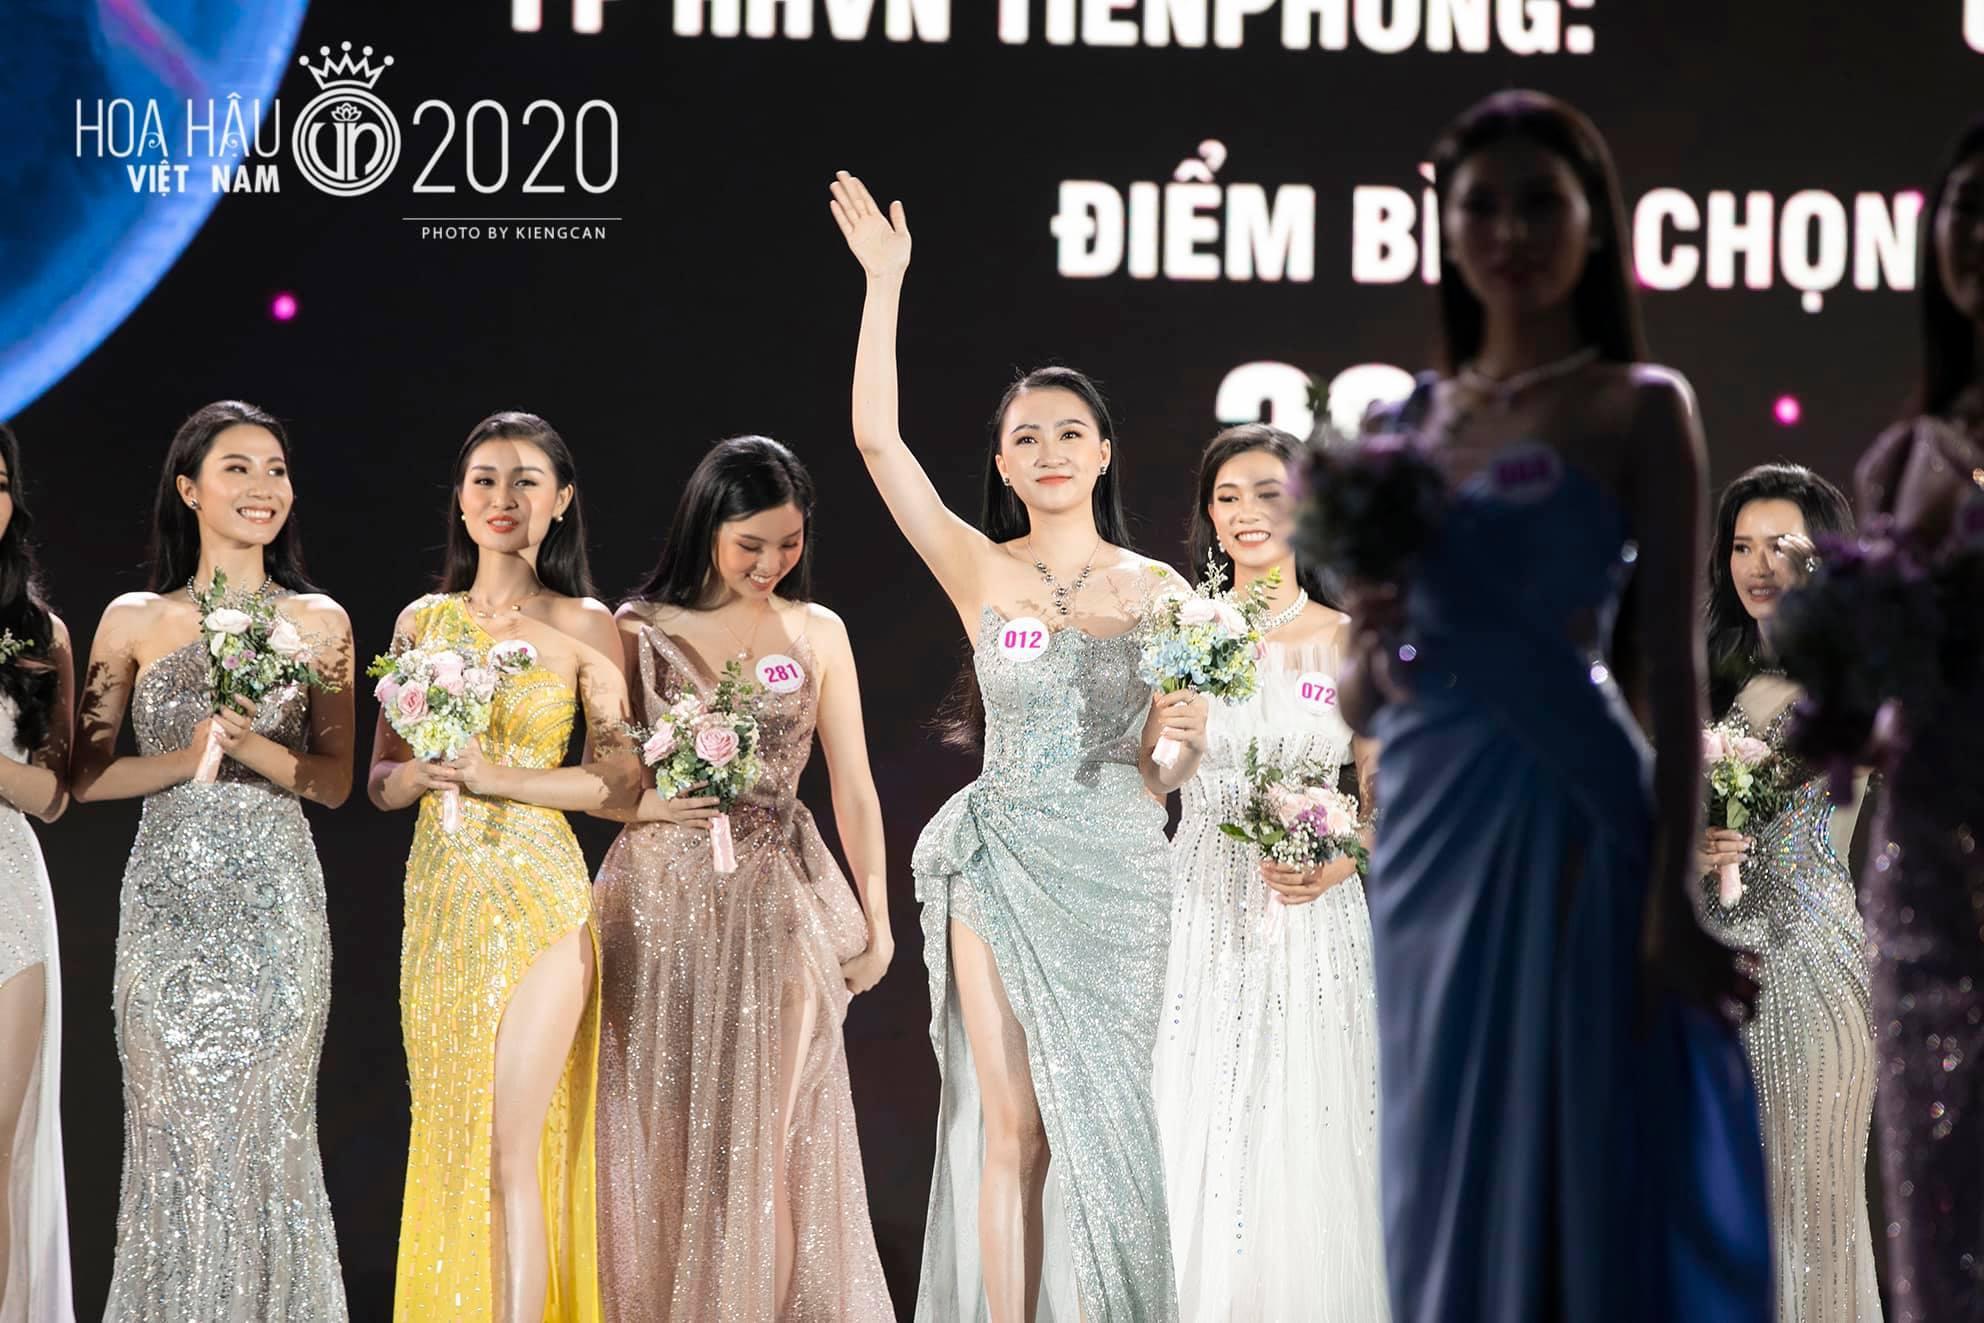 Hoa hậu Việt Nam 2020 Kim Trà My 1